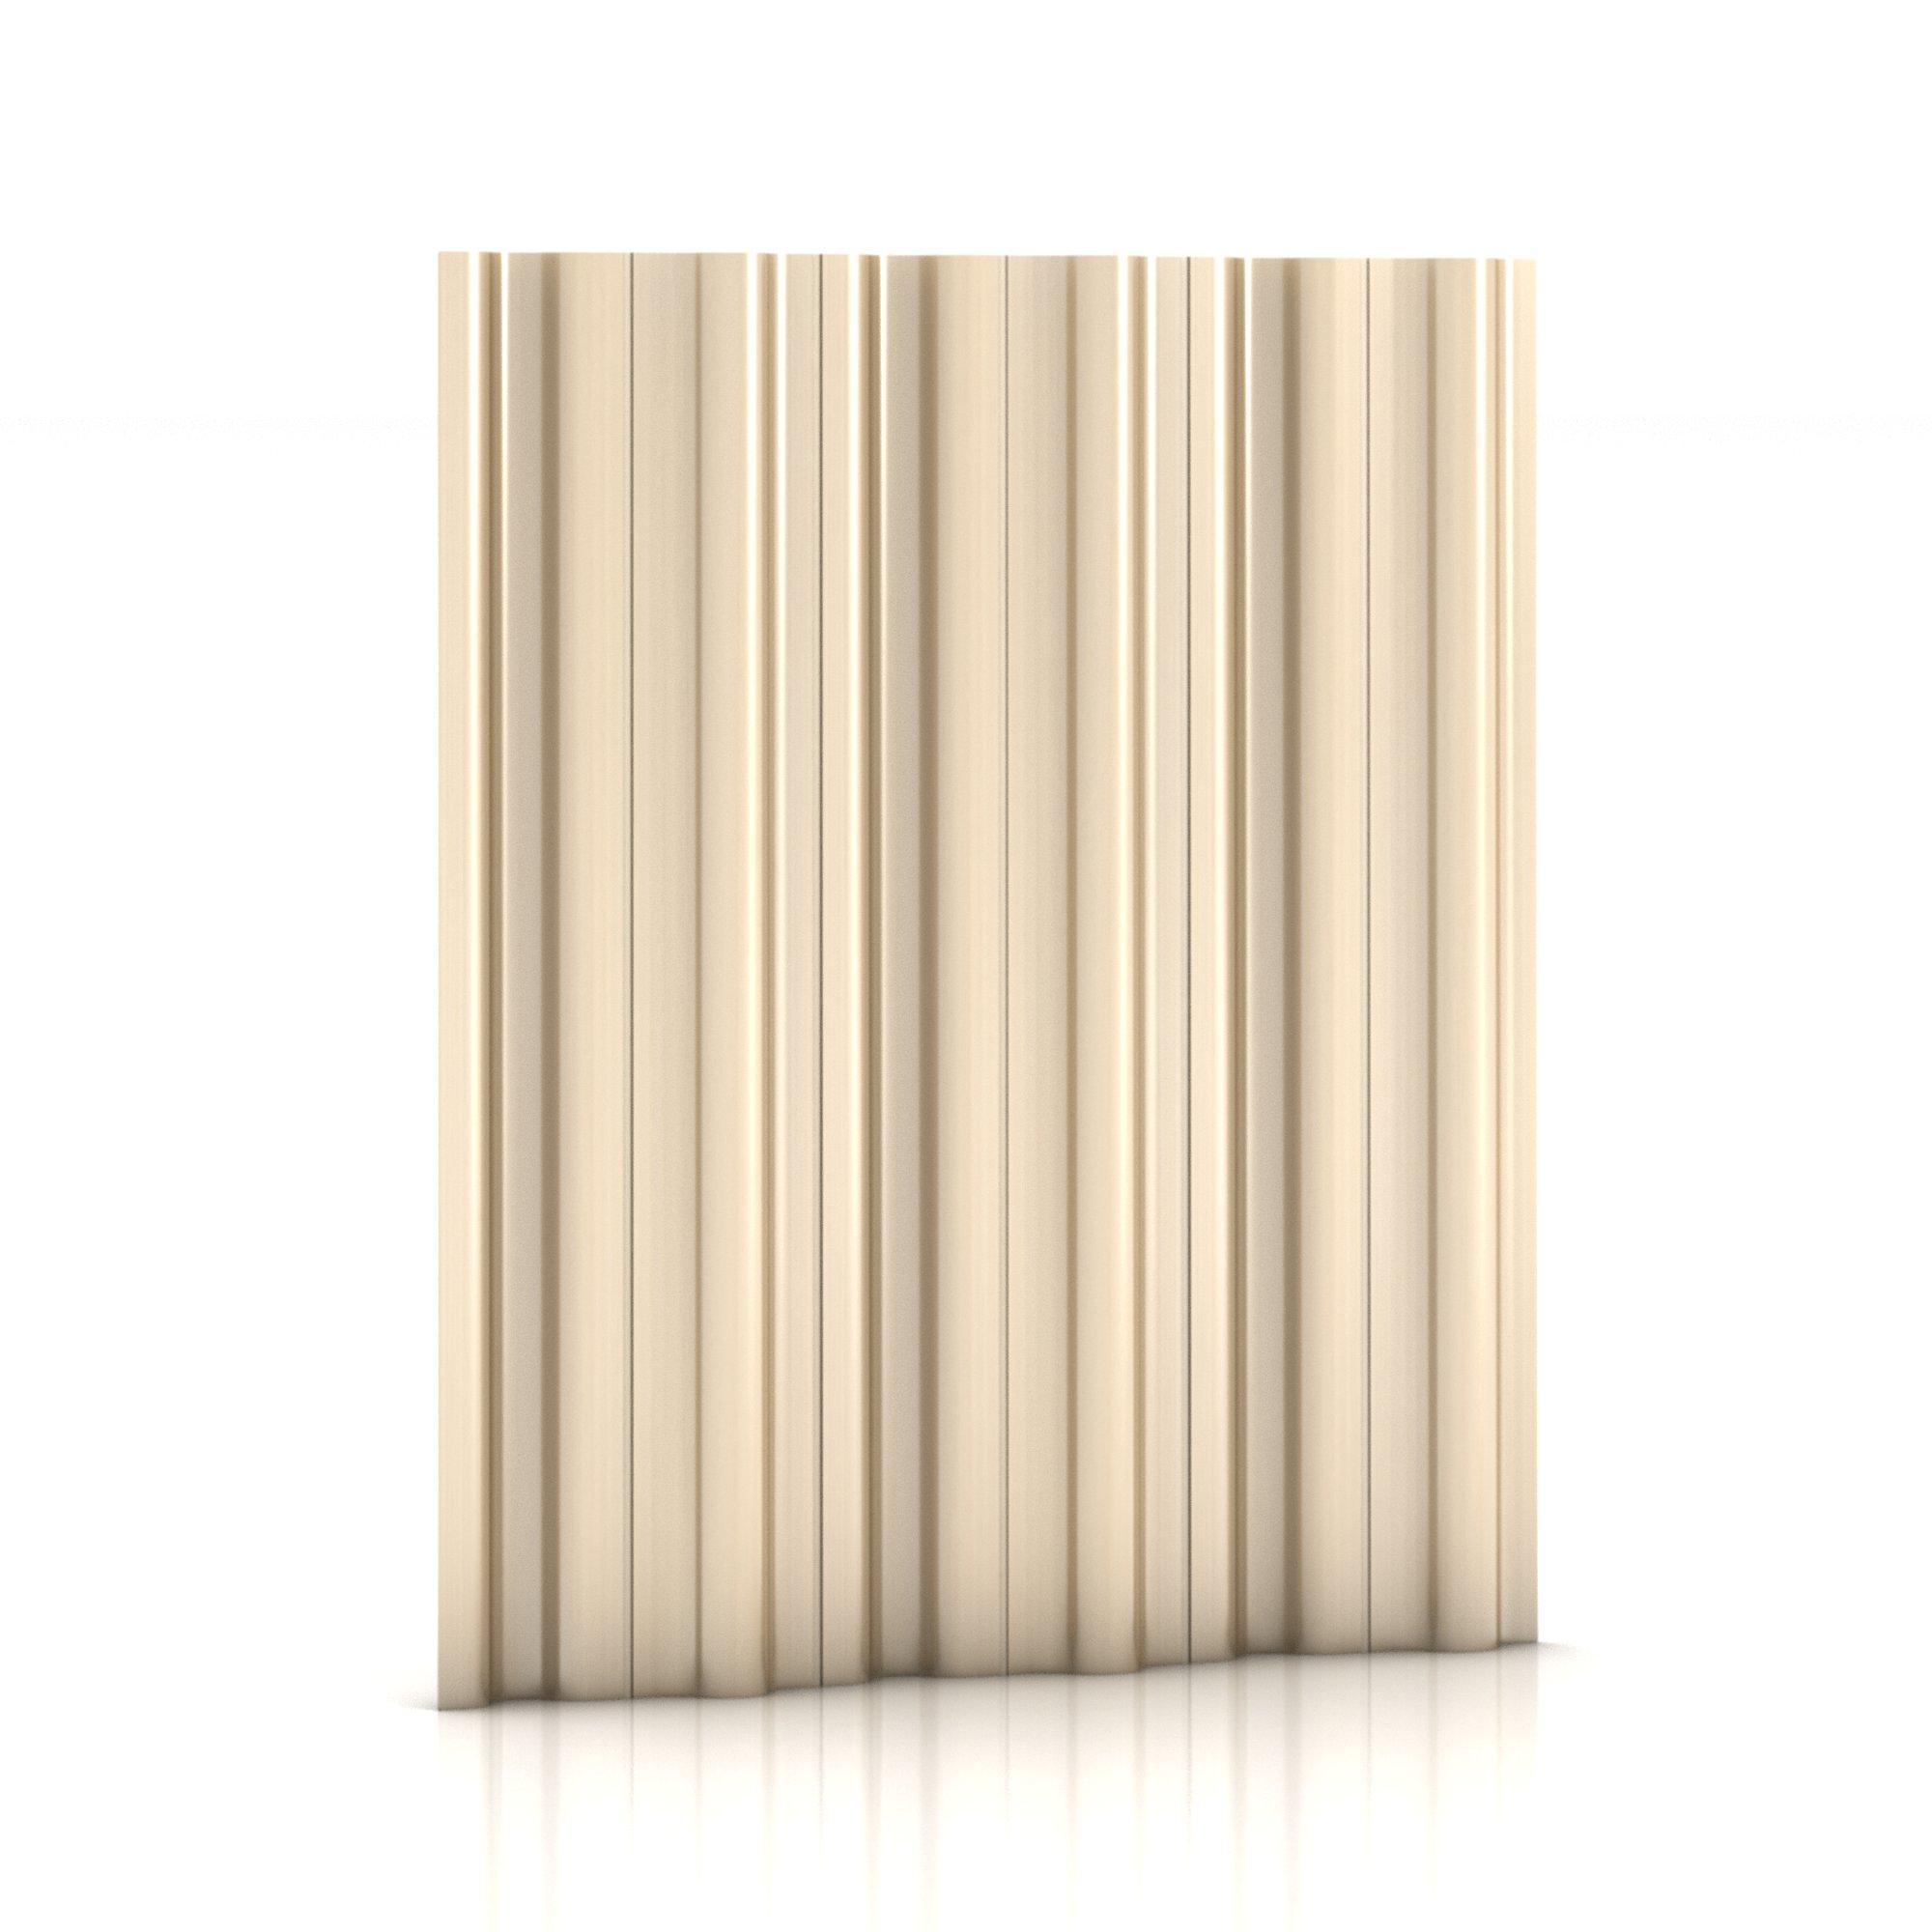 Folding Screen Herman Miller Eamesar Molded Plywood Folding Screen Gr Shop Canada